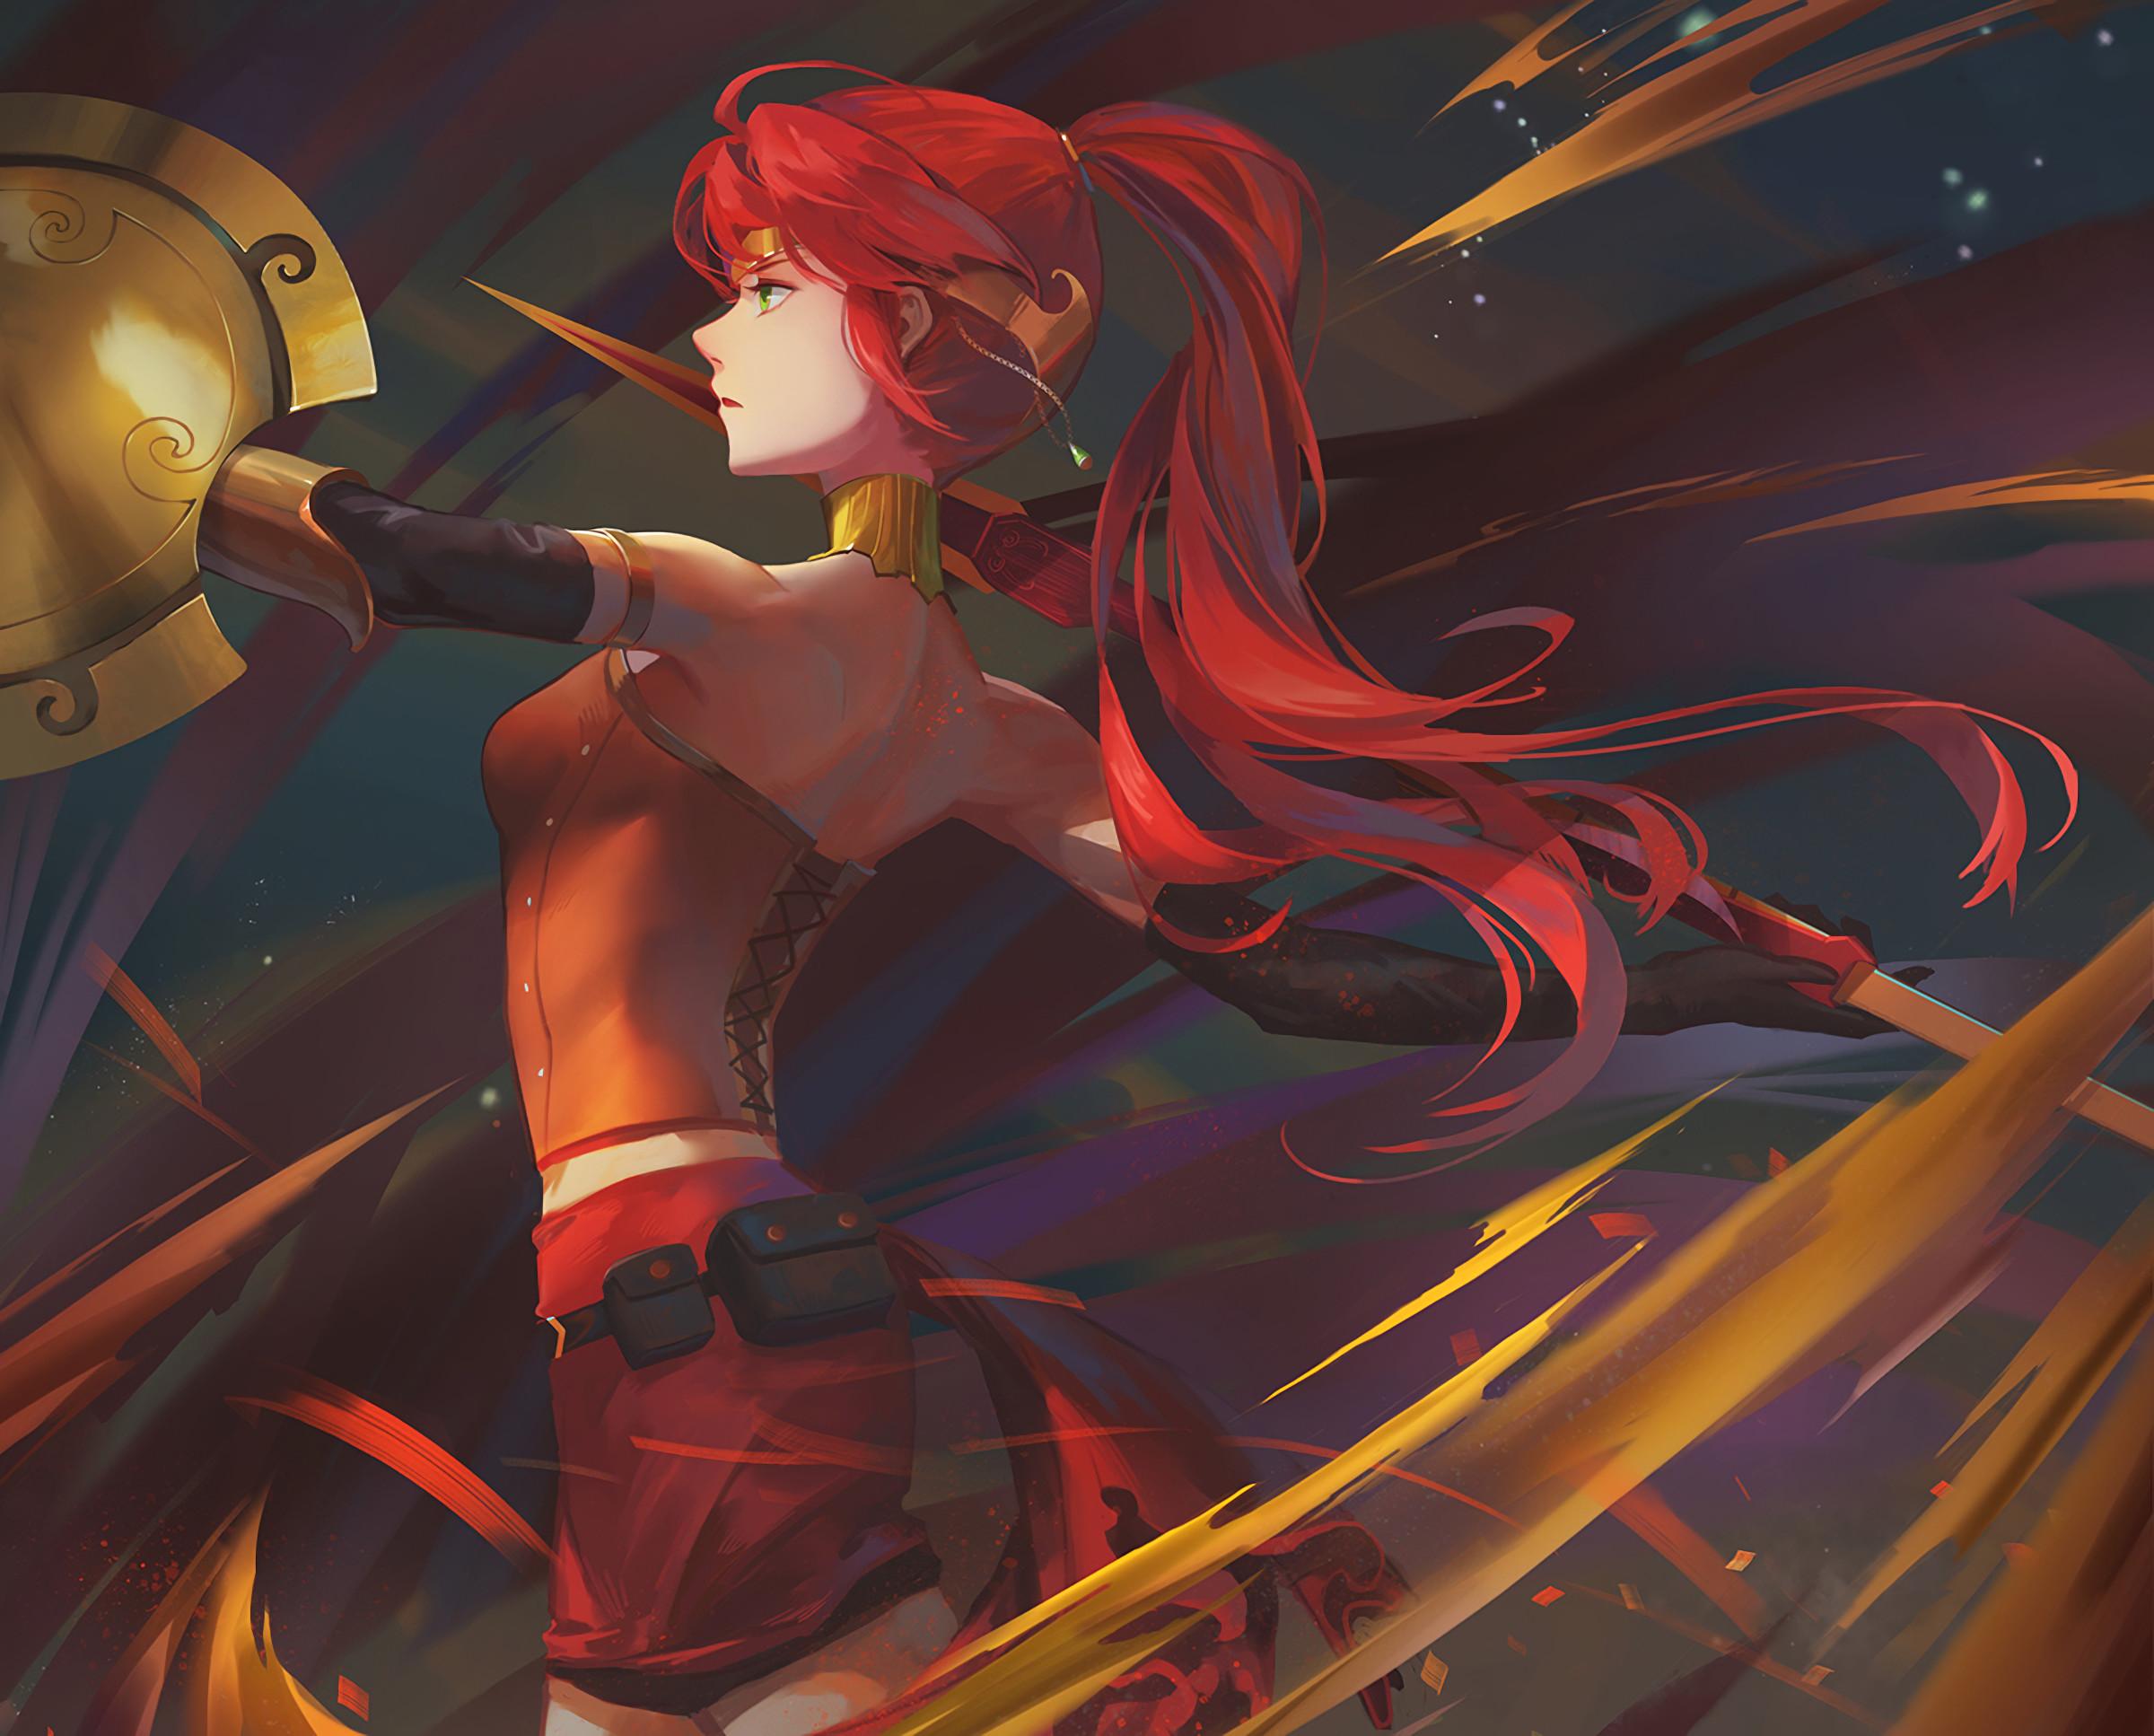 Anime anime anime girls RWBY Pyrrha Nikos long hair redhead weapon